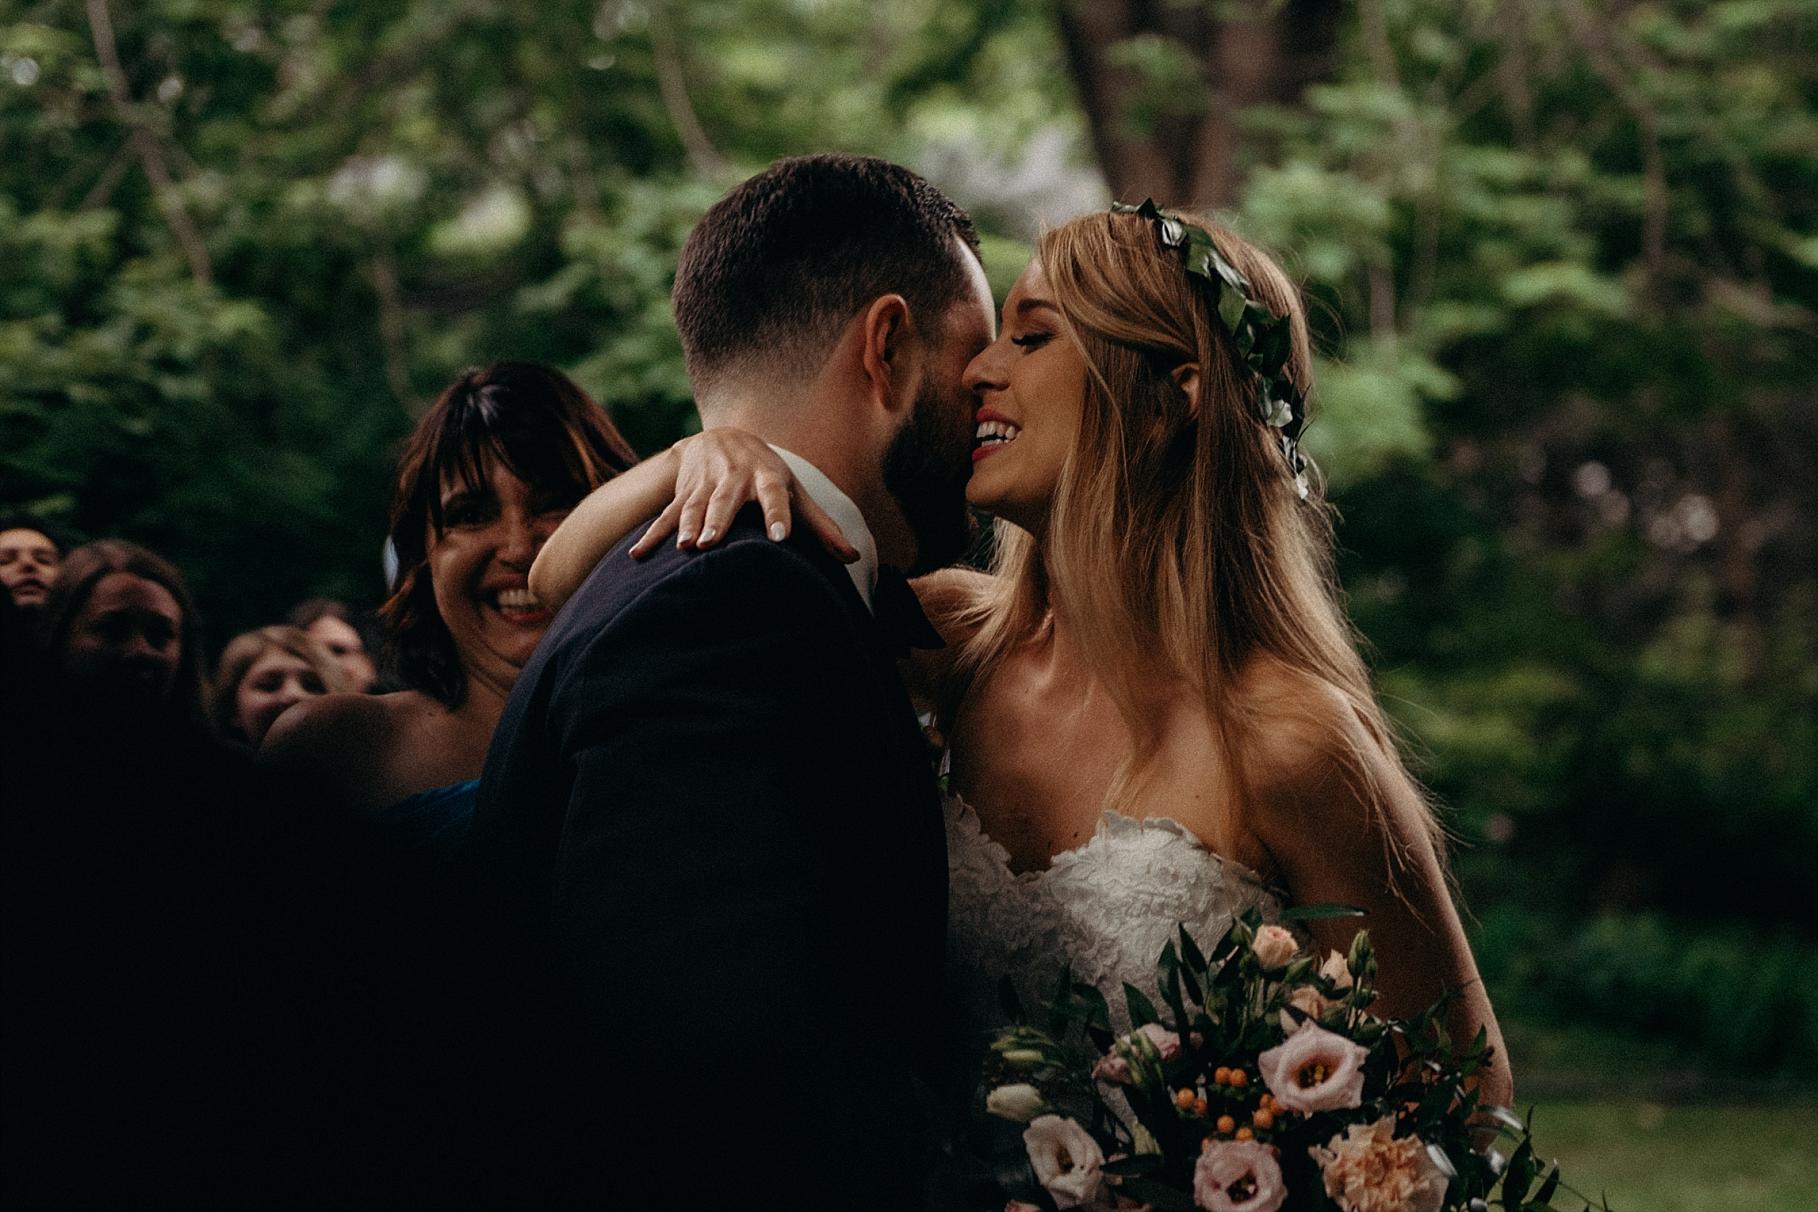 Saunders Farm Wedding Mocha Tree Studios Ottawa Toronto Montreal Wedding and Engagement Photographer and Videographer Dark Moody Intimate Authentic Modern Romantic Cinematic Best Candid 9